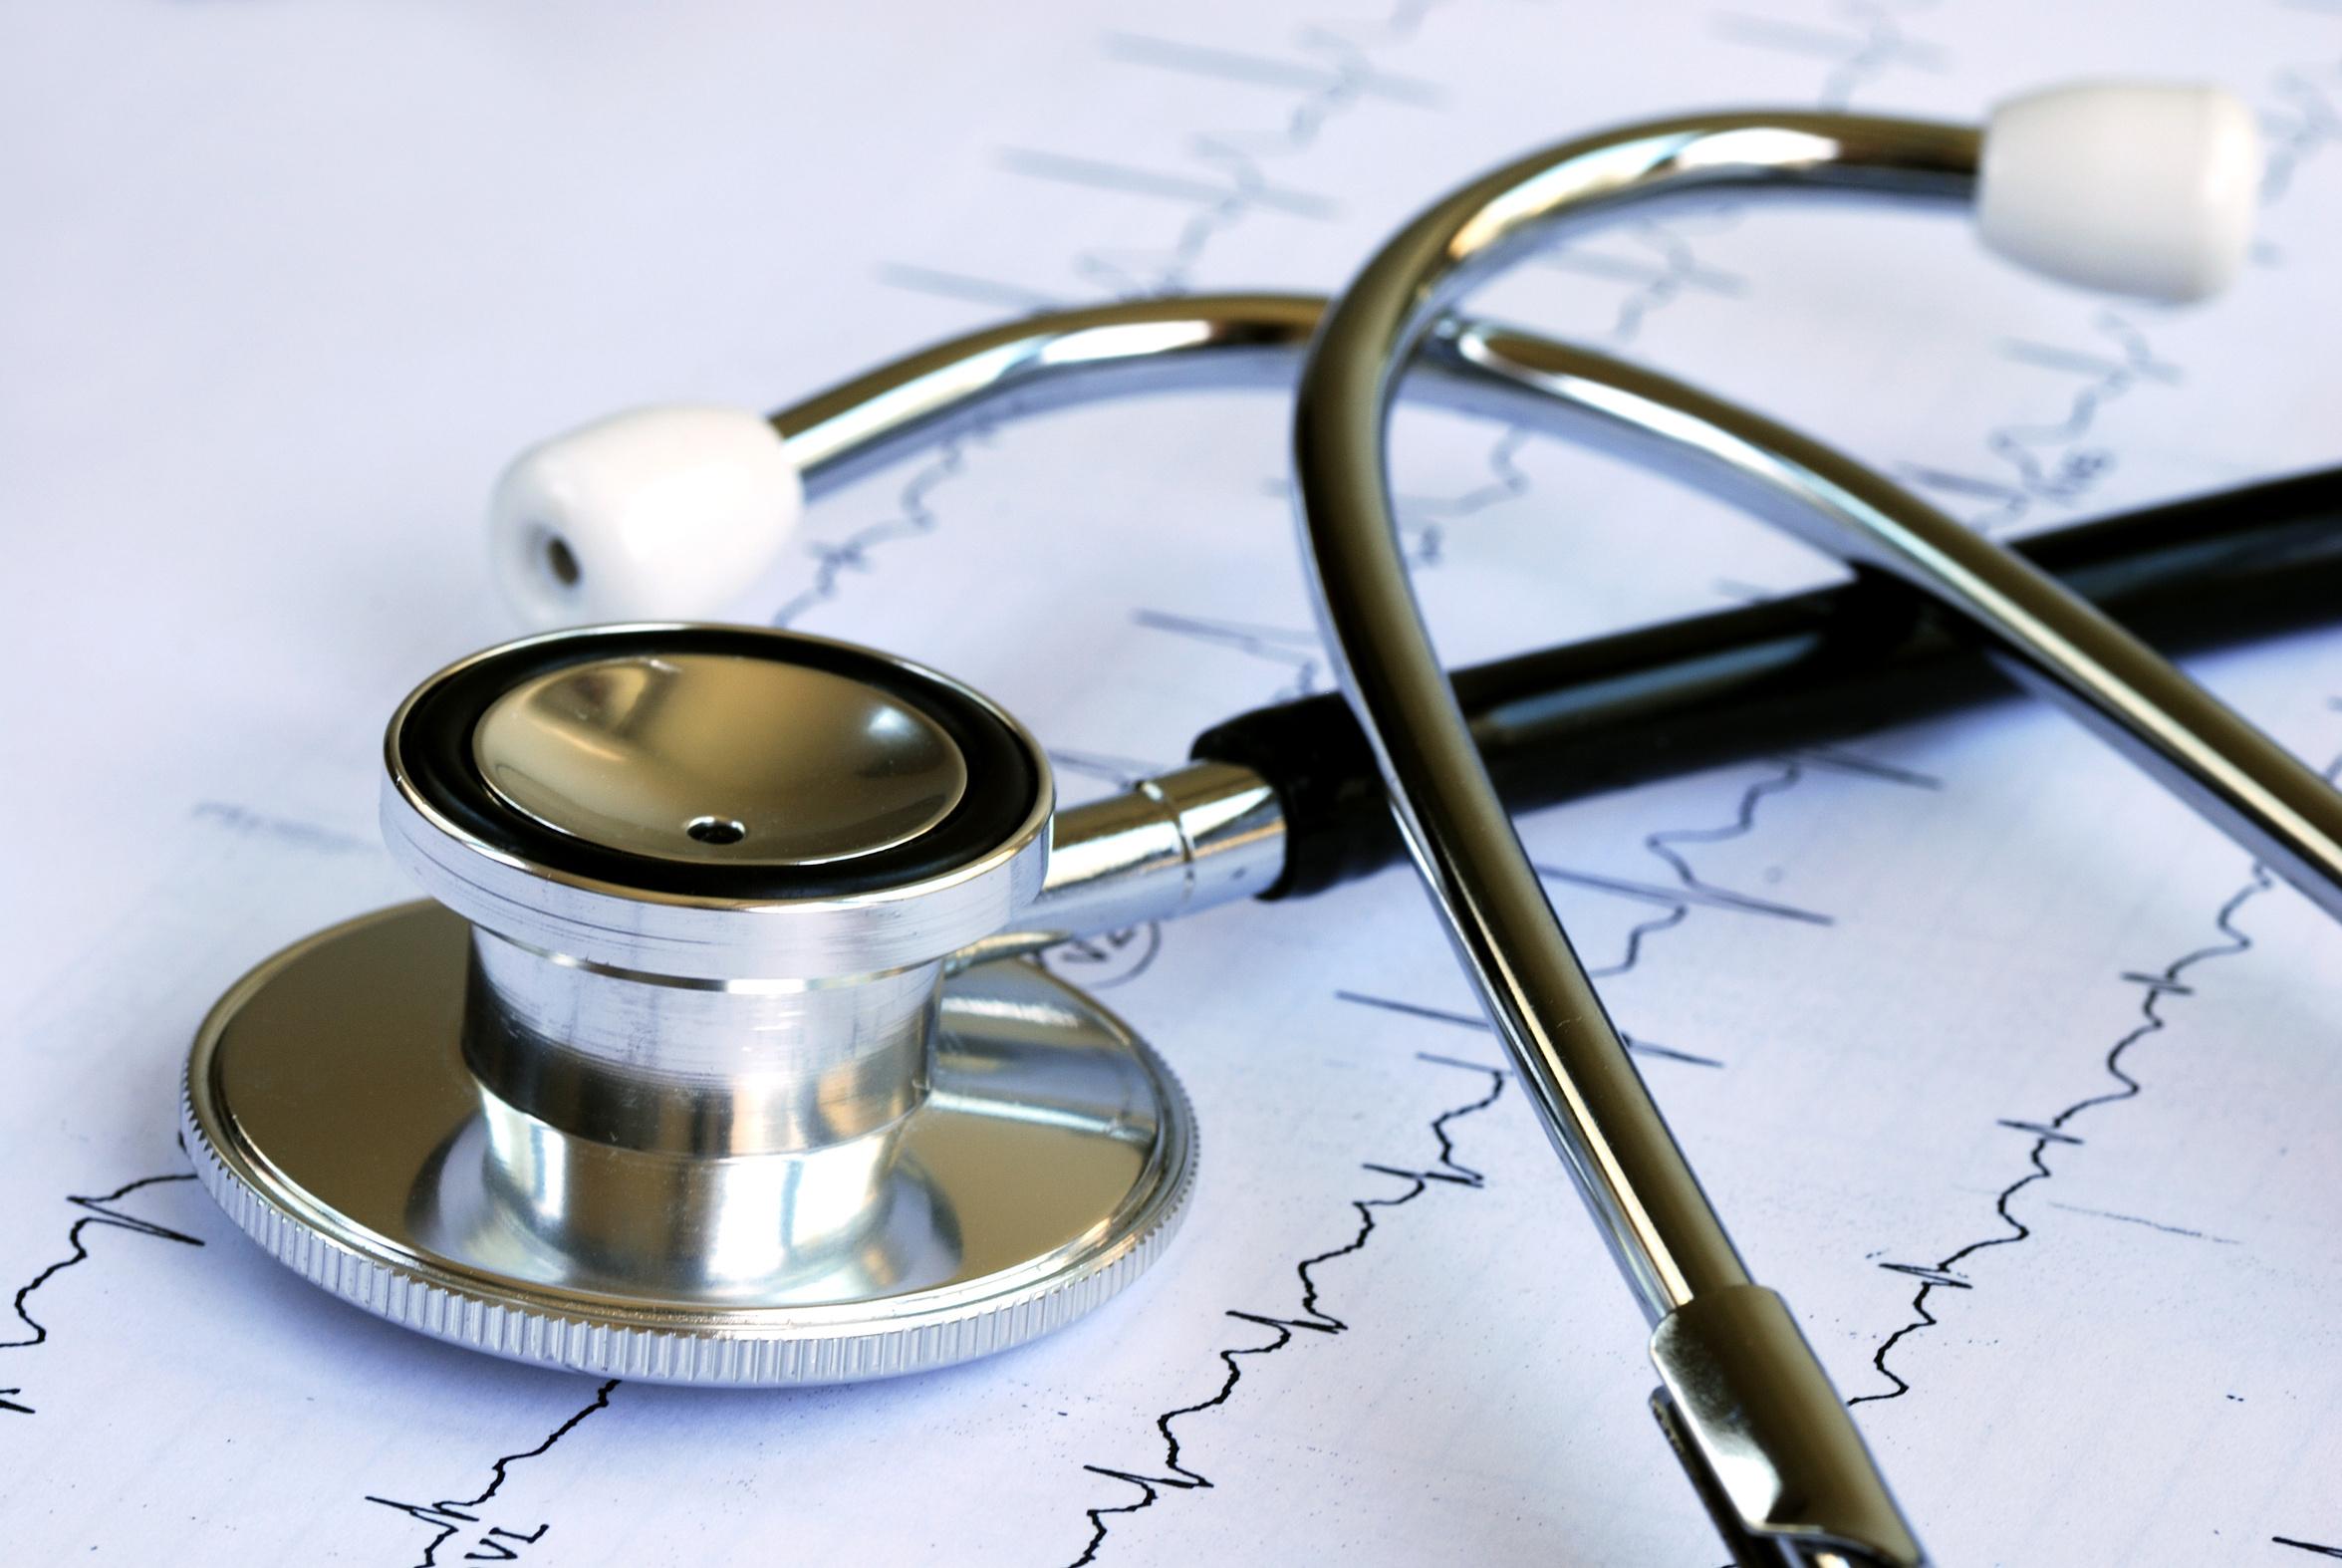 Картинки для, медицина в картинках